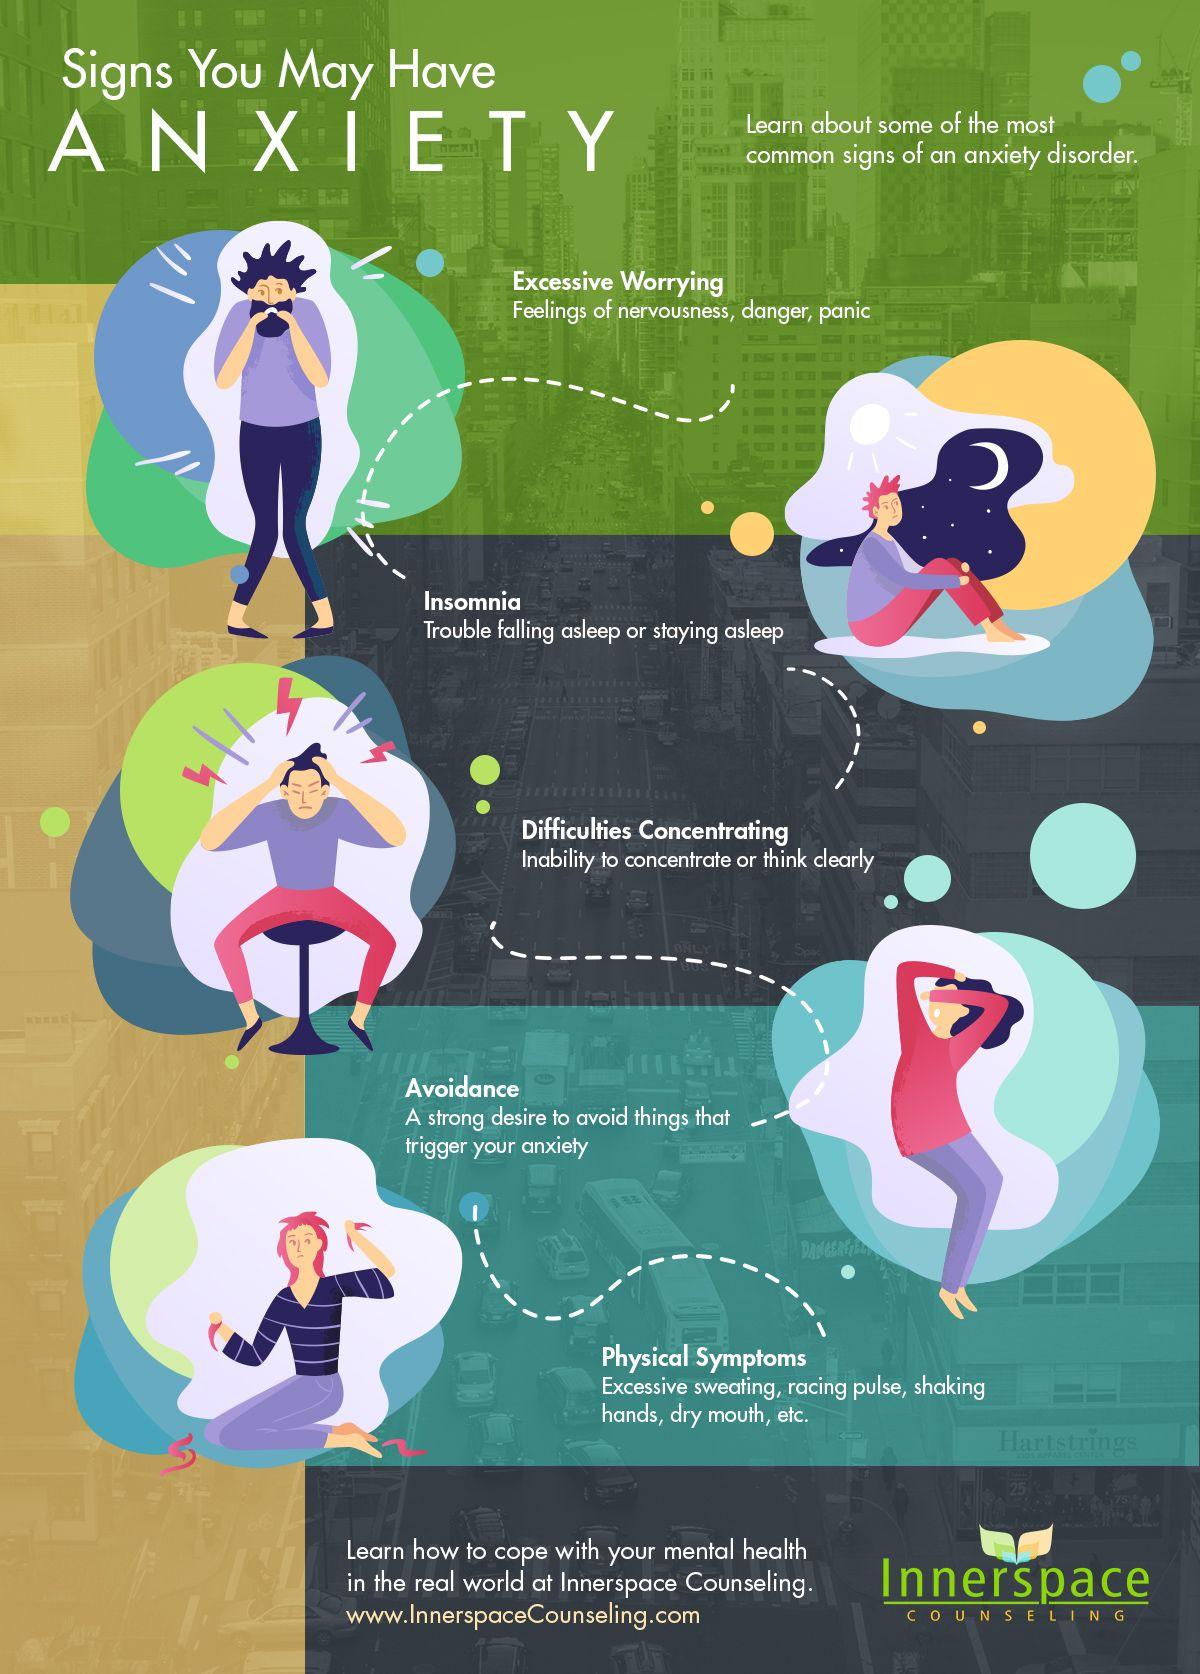 anxiety-infographic-5f121b30ee283.jpg